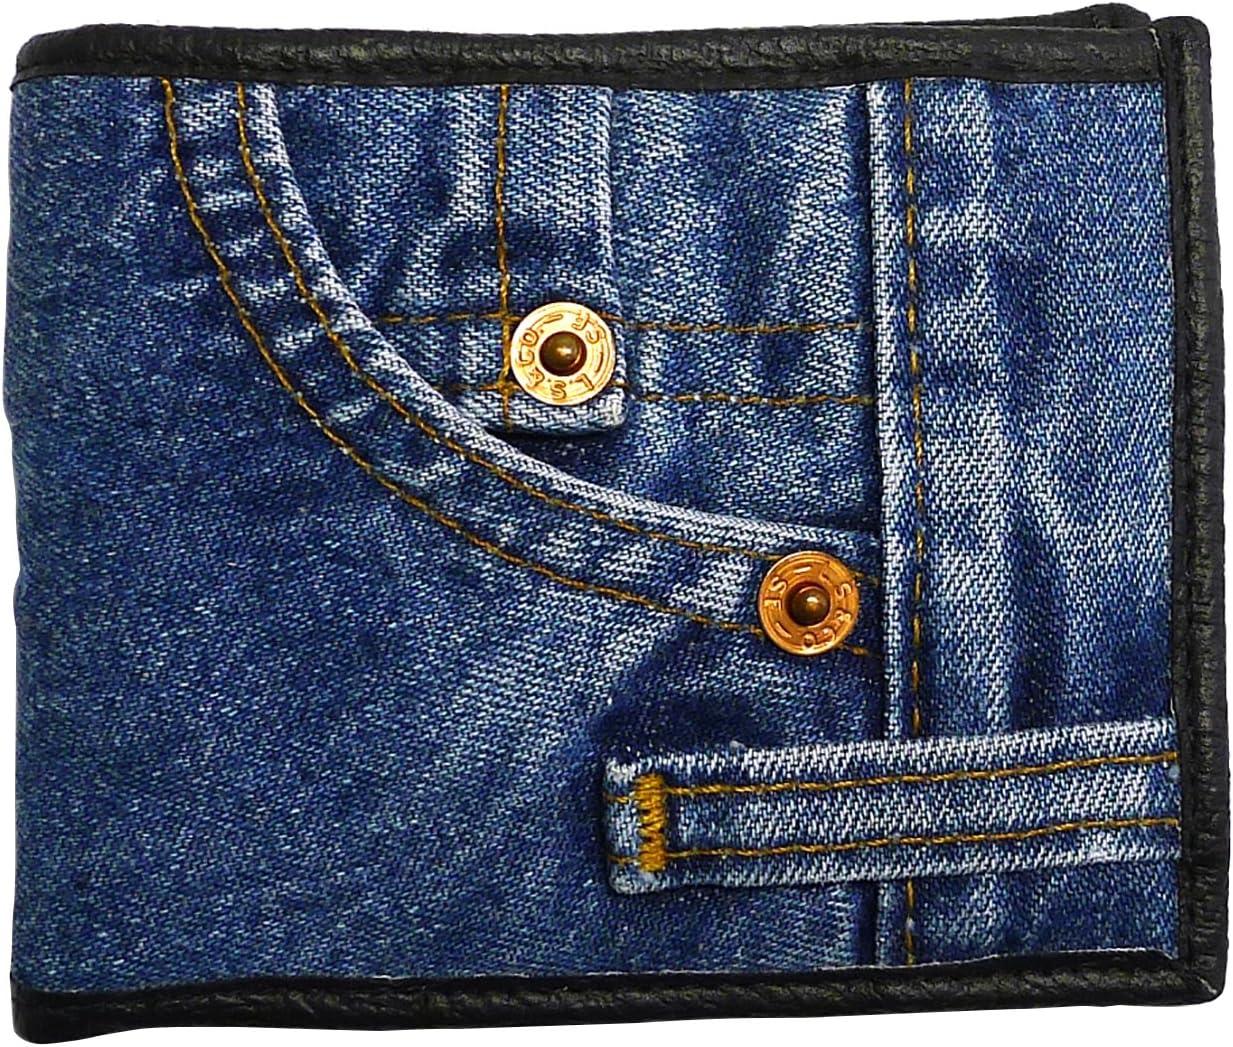 Bijoux De Ja Unisex Blue Denim Small Billfold Purse Wallet